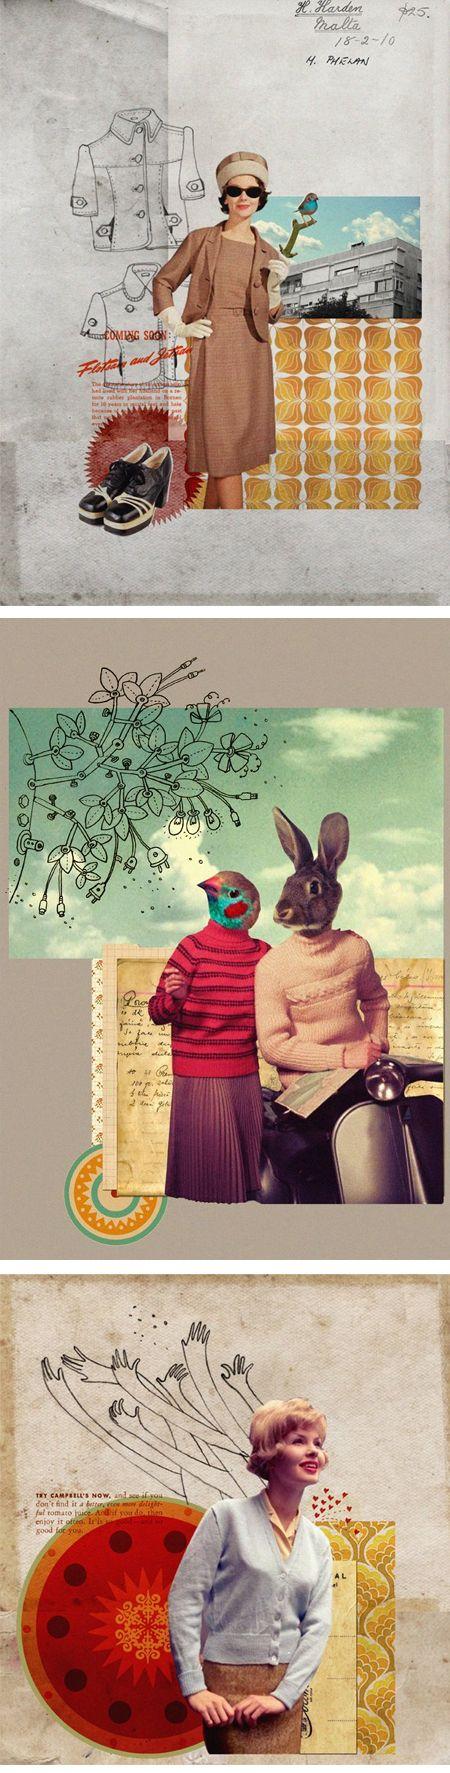 Esen Demirci: Journals, Jealous Clean, The Artists, Collage Art, Esen Demirci, Illustration, Graphics, Fk Esendemirci, Mixed Media Collage